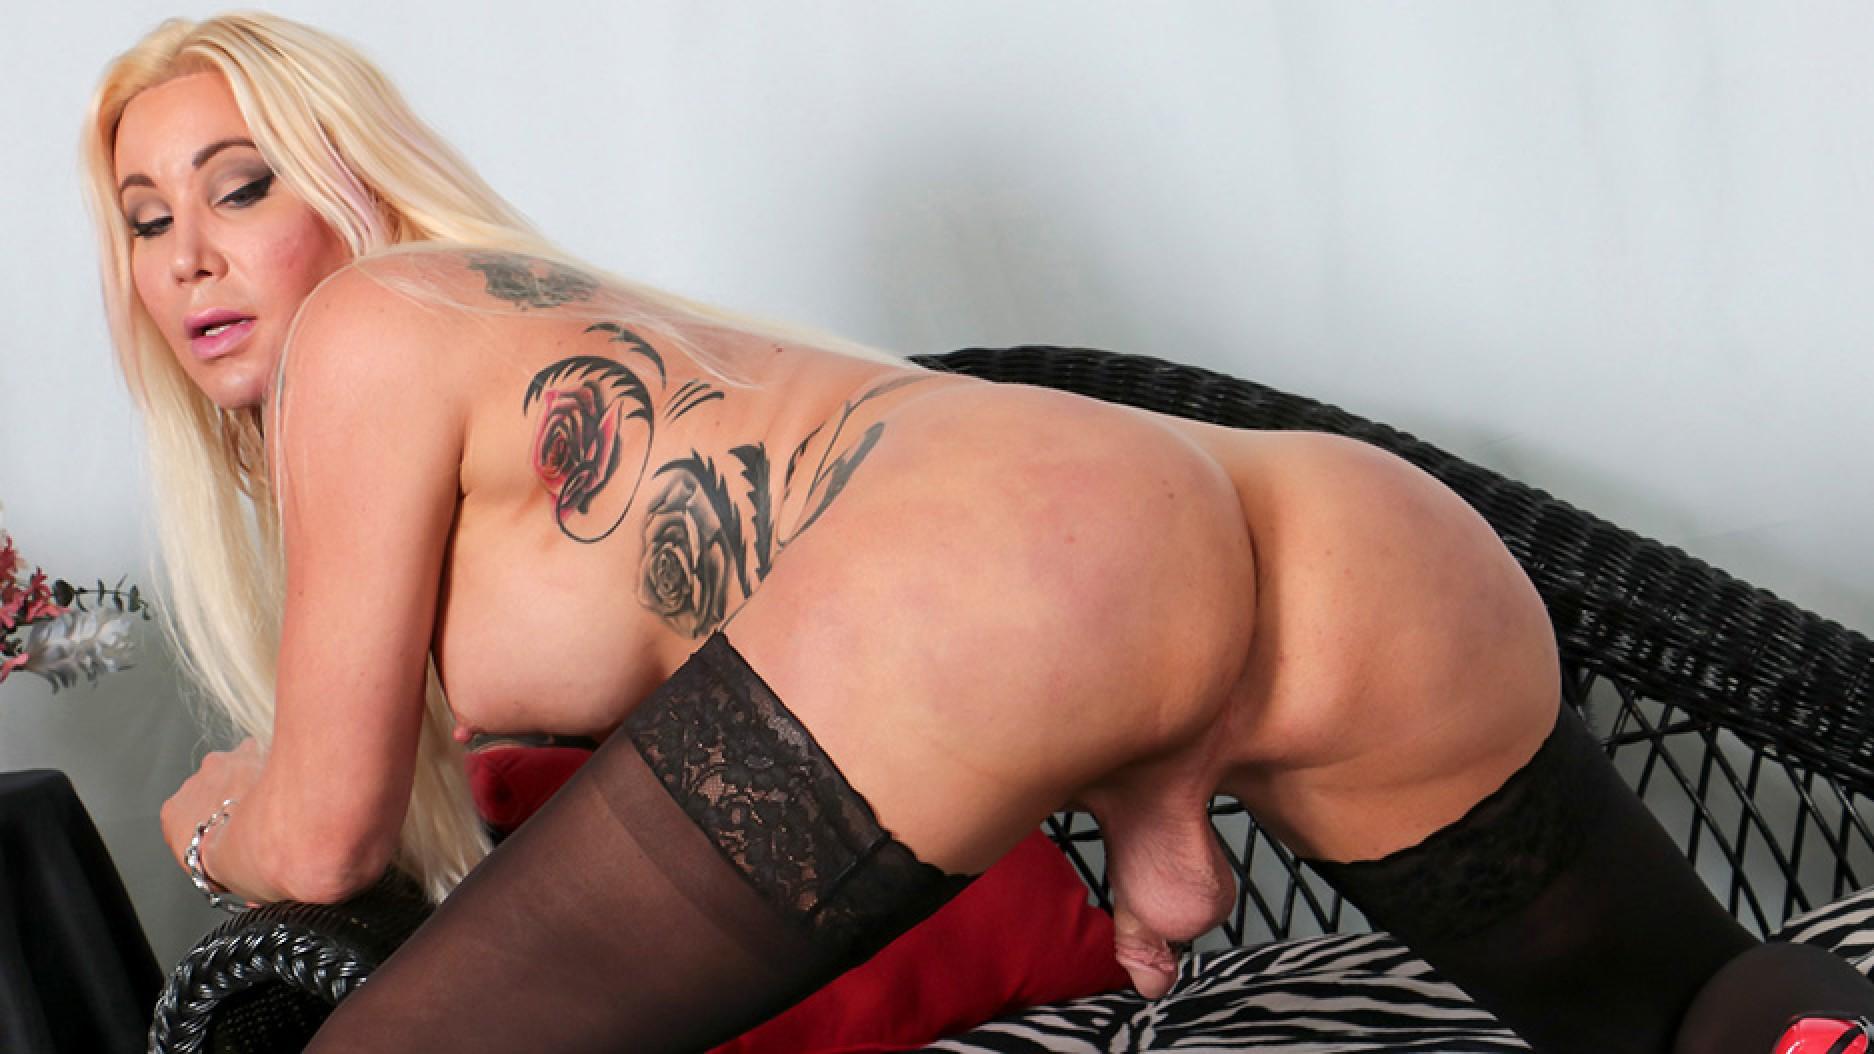 ShemaleYum Horny Blonde Josie Wails Shakes Her Booty! Added  28th Jan 2017 Tranny XXX Siterip PORN RIP